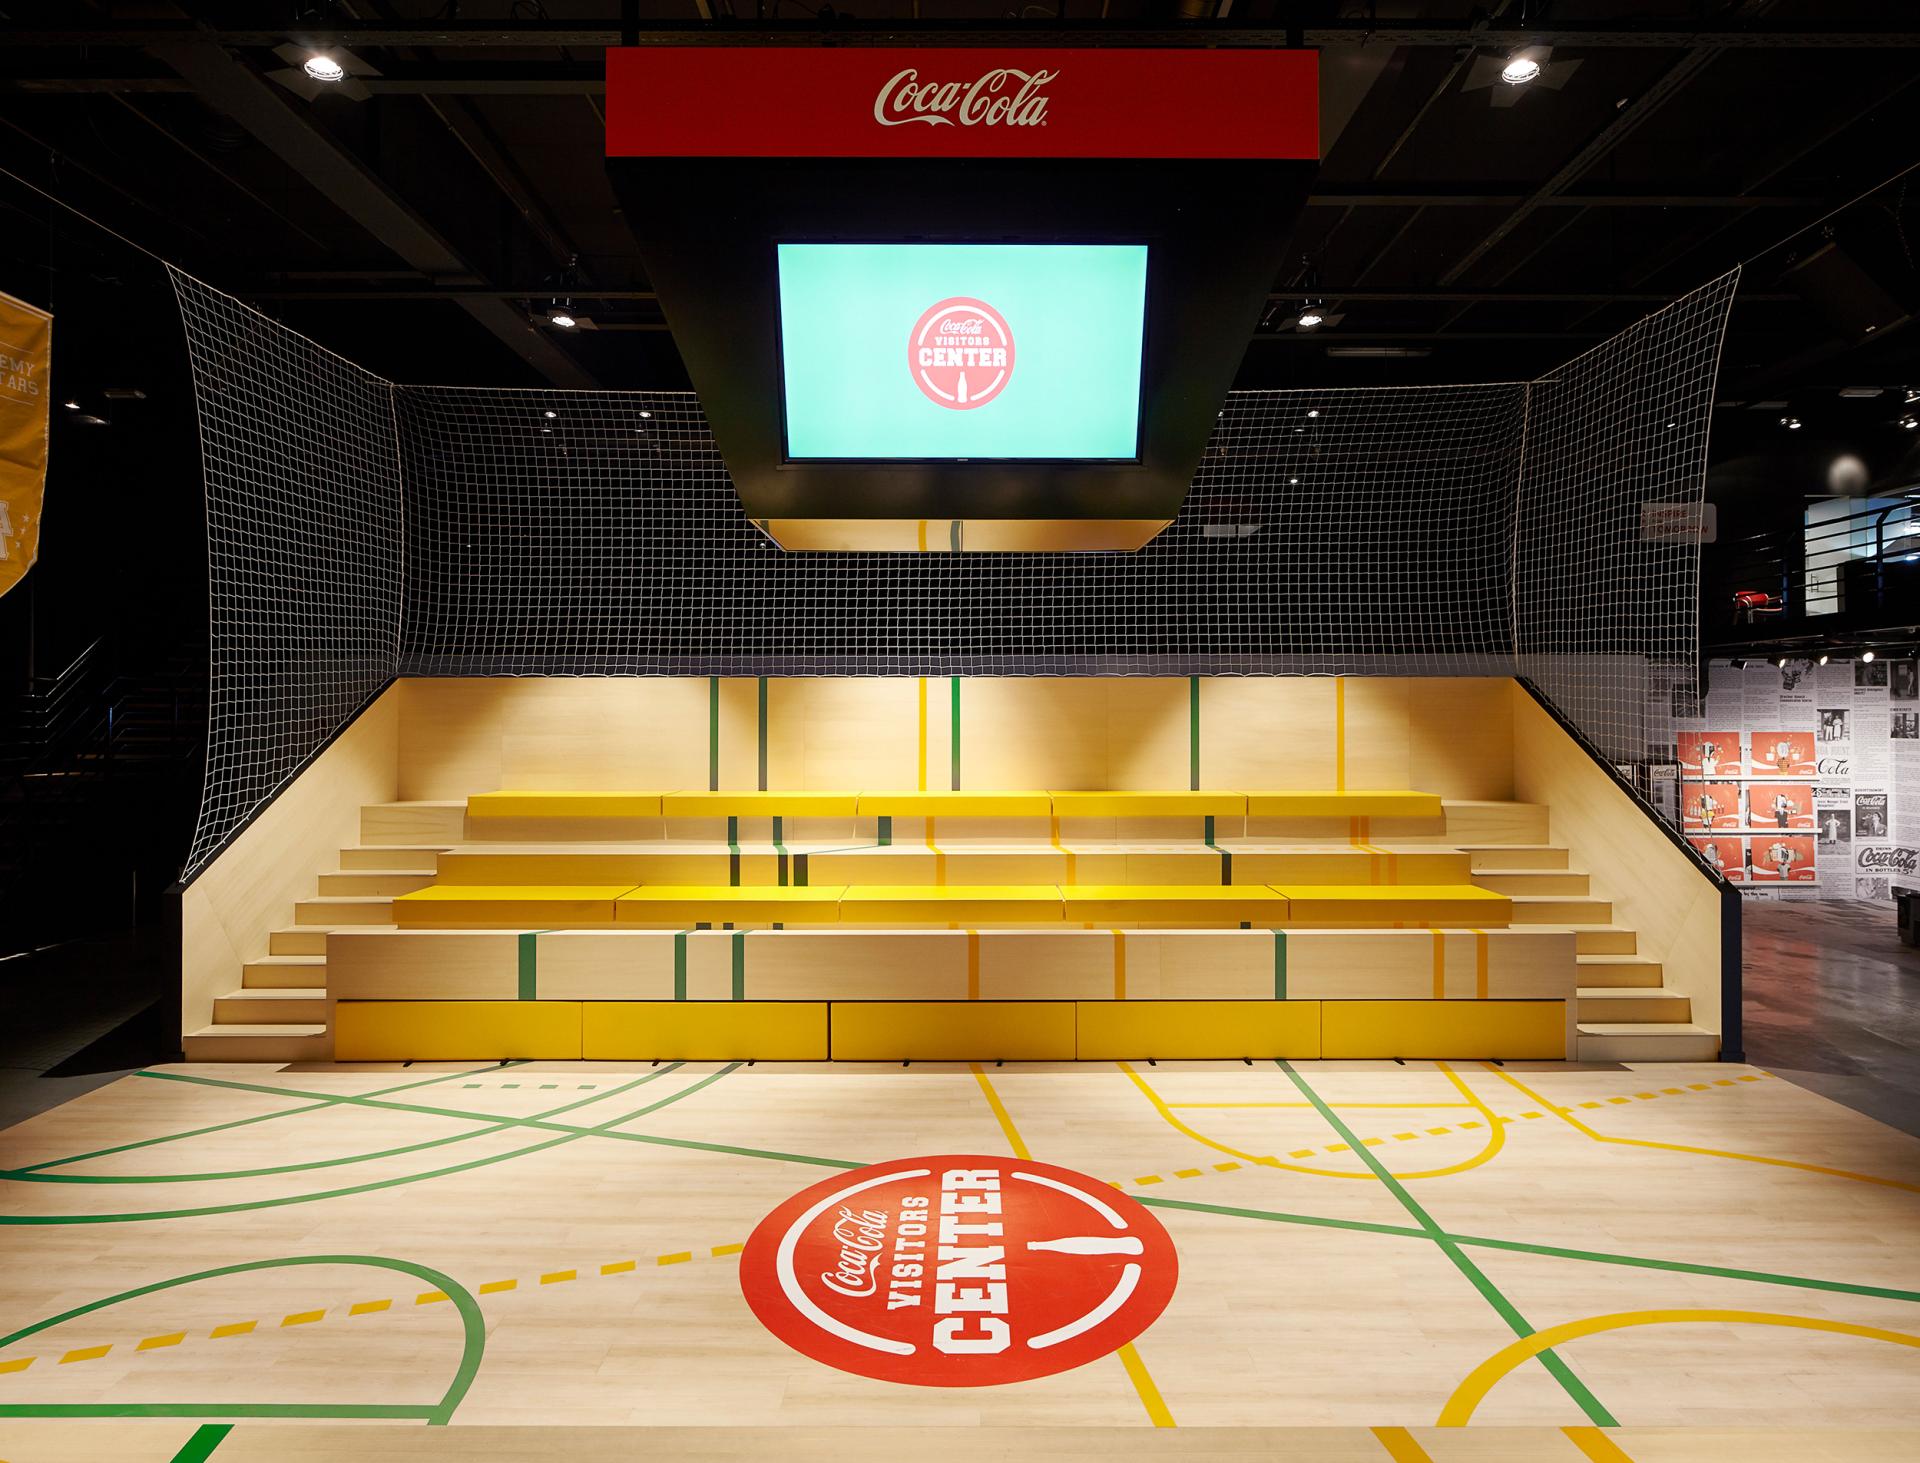 Creneau Interior Design Agency Dubai Middle East Coca-Cola